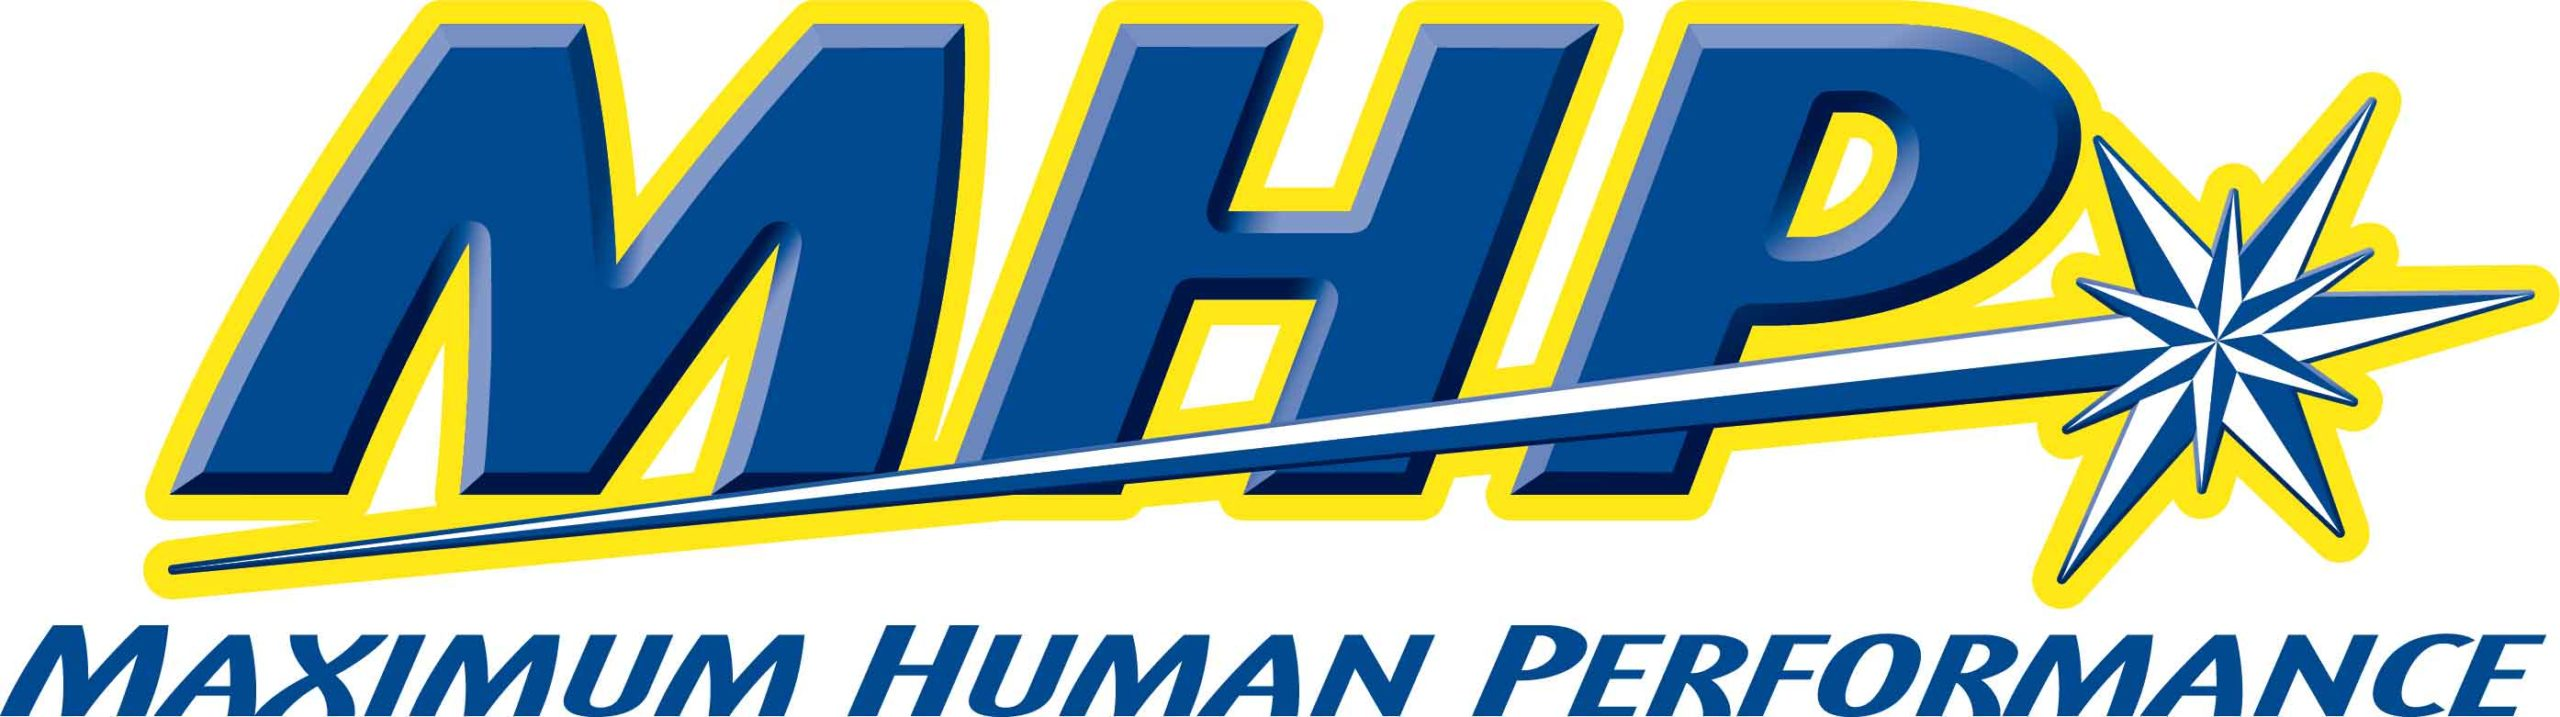 Maximum Human Performance